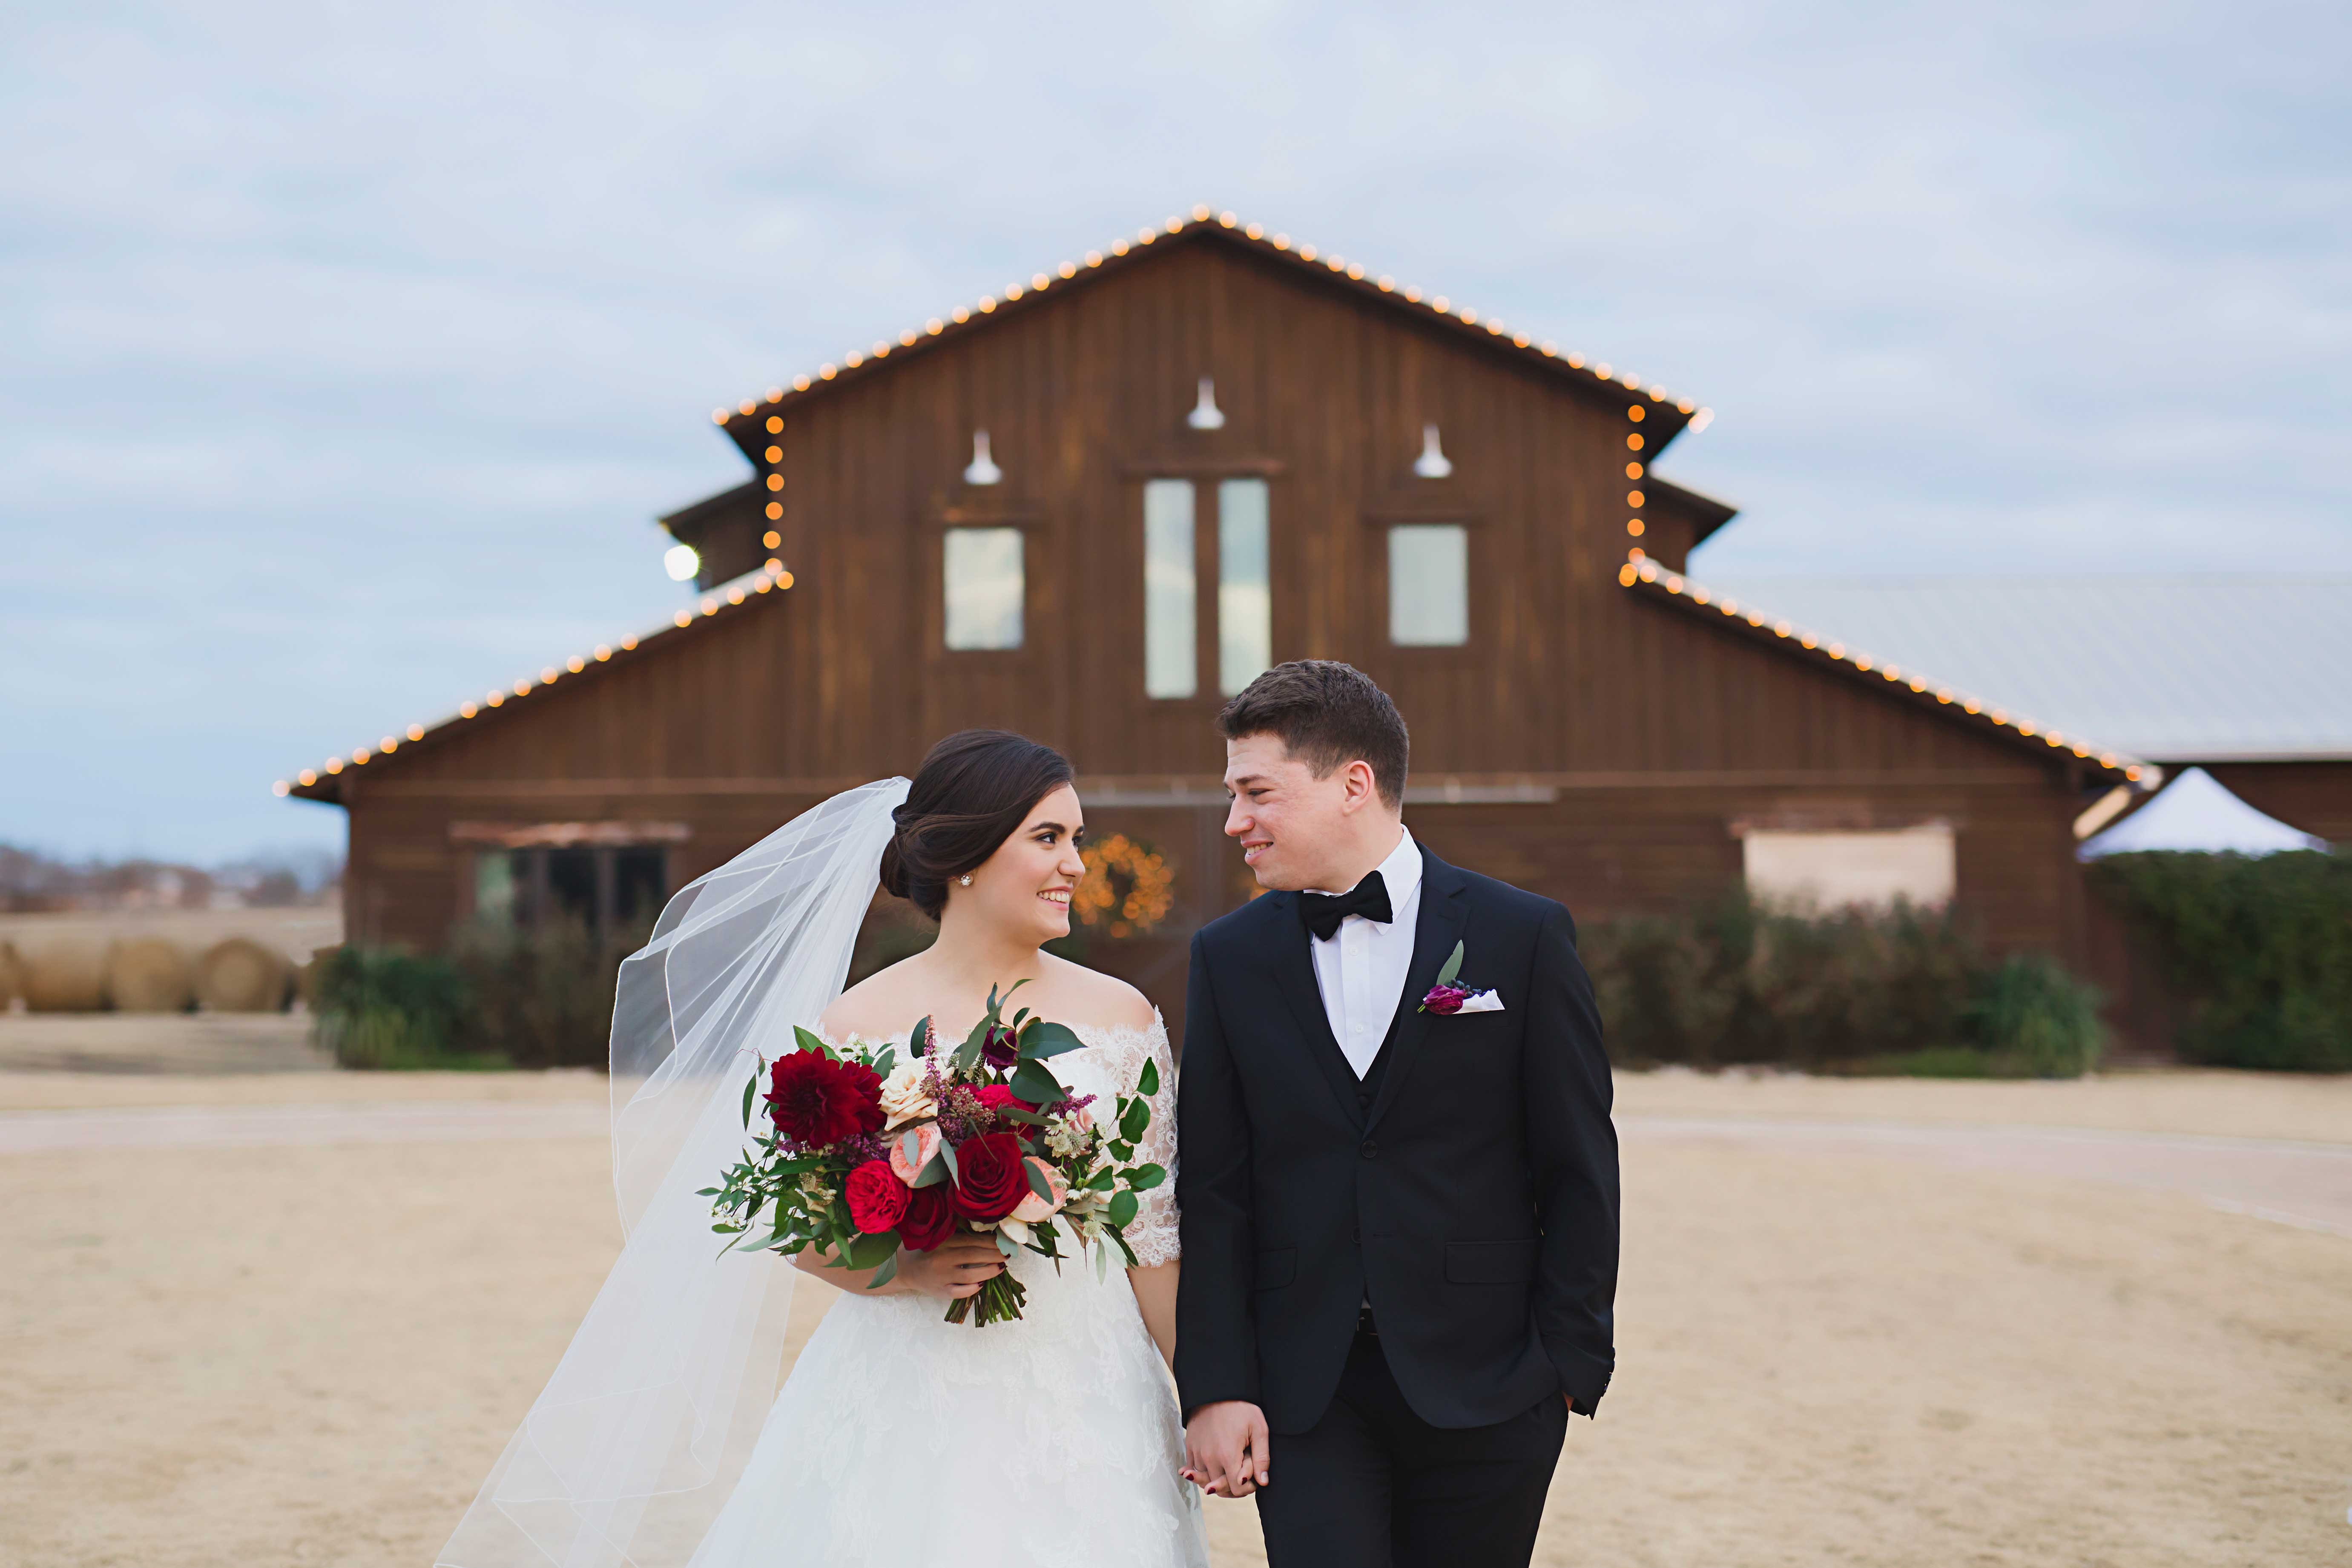 Real Weddings Zola: Real Wedding – Shelby & James